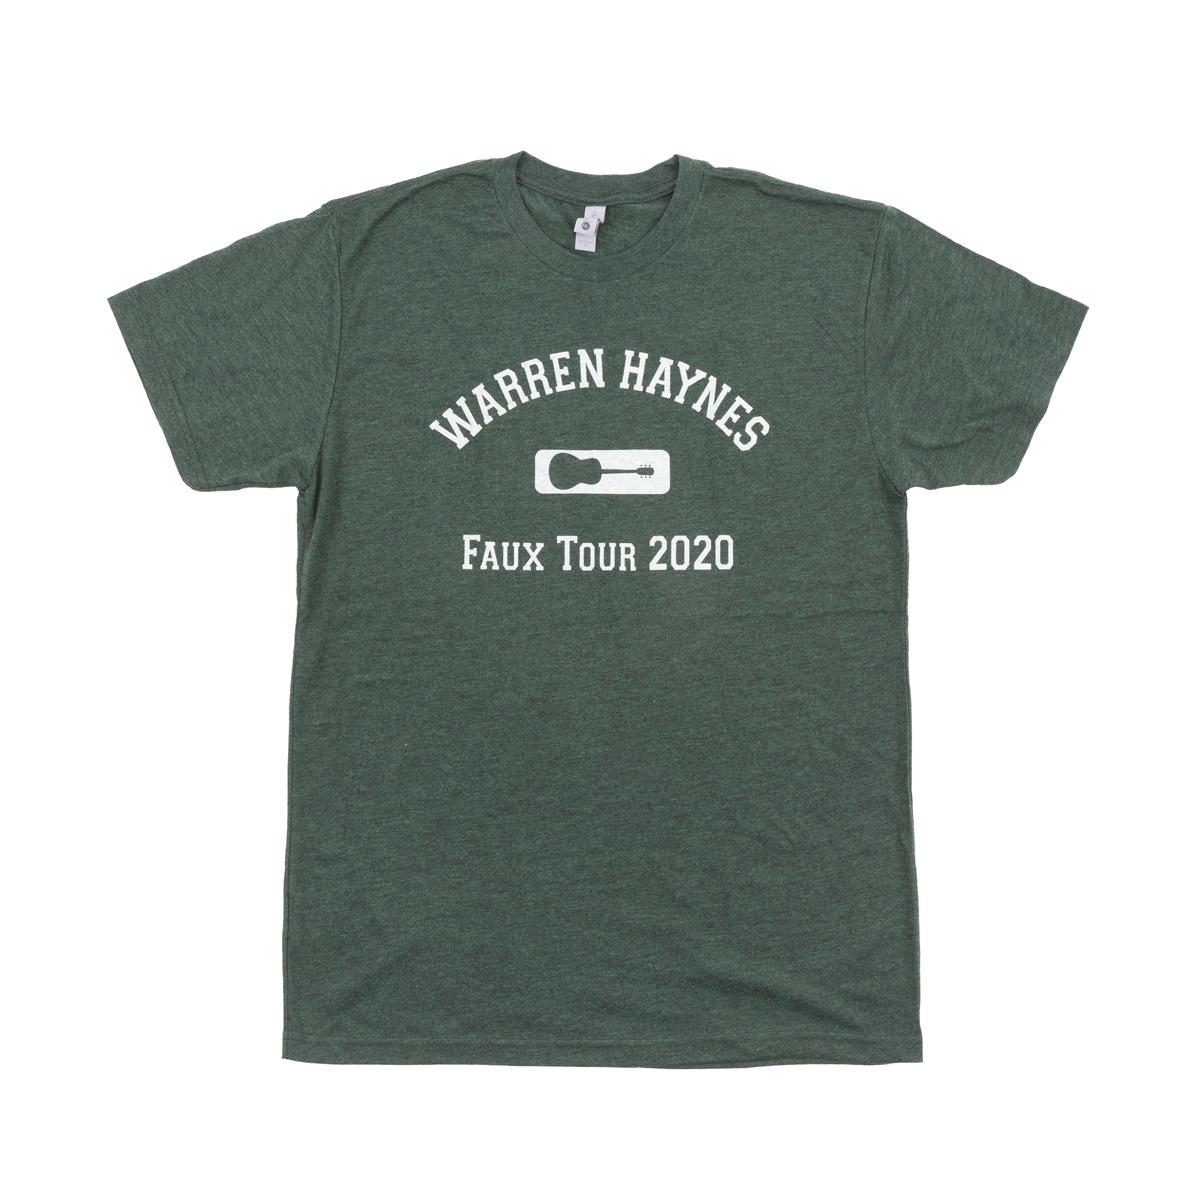 Faux Tour 2020 Guitar Logo T-Shirt